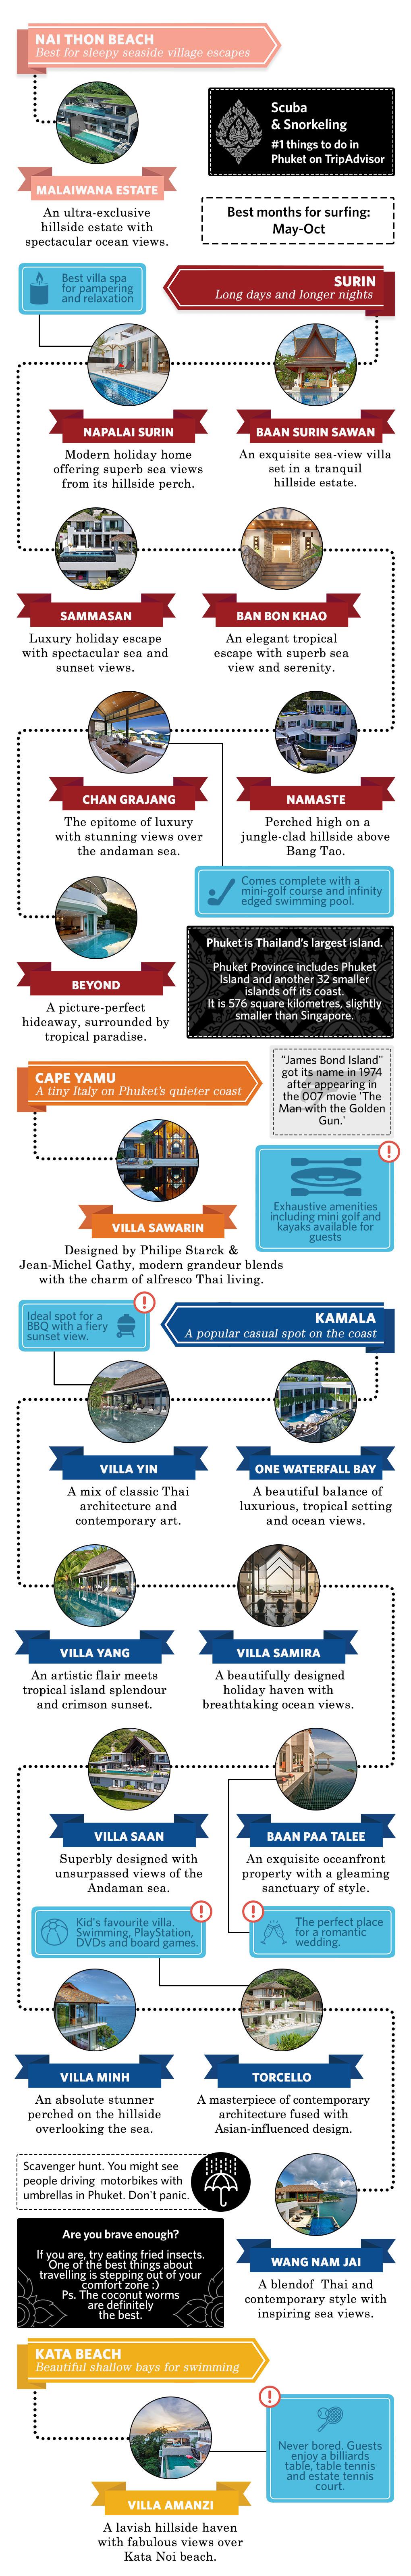 Phuket beach villas map